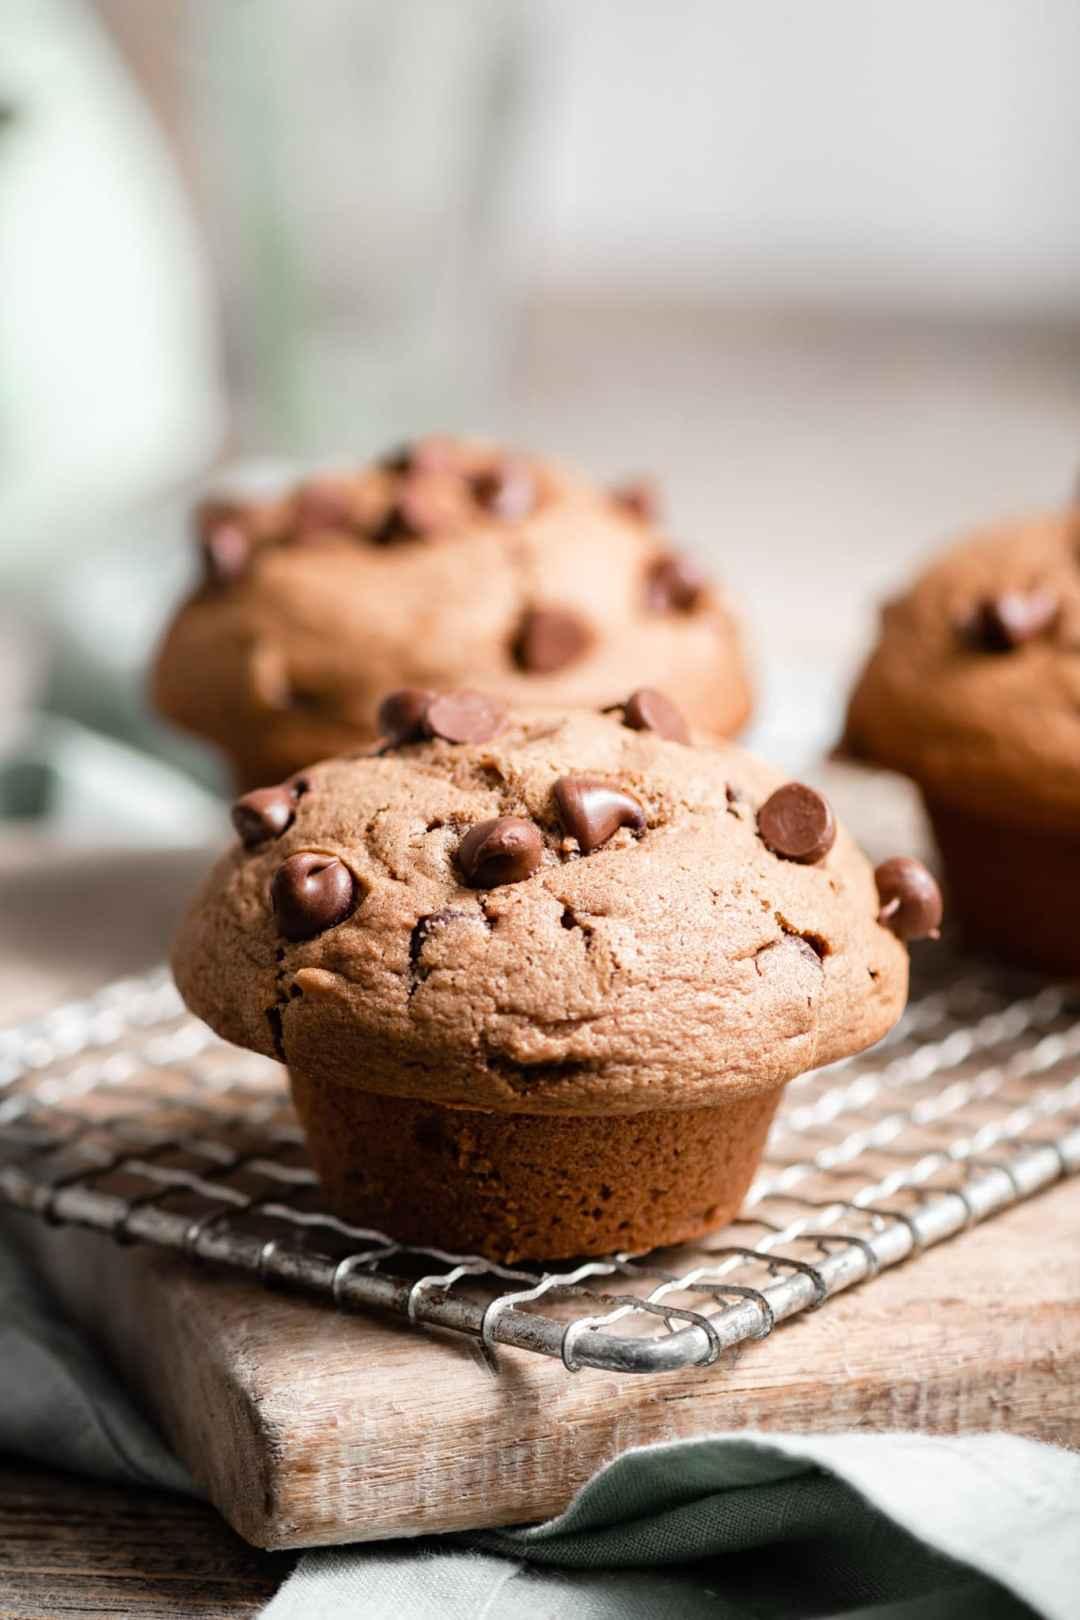 FLuffy Chocolate Chip Muffin Recipe.